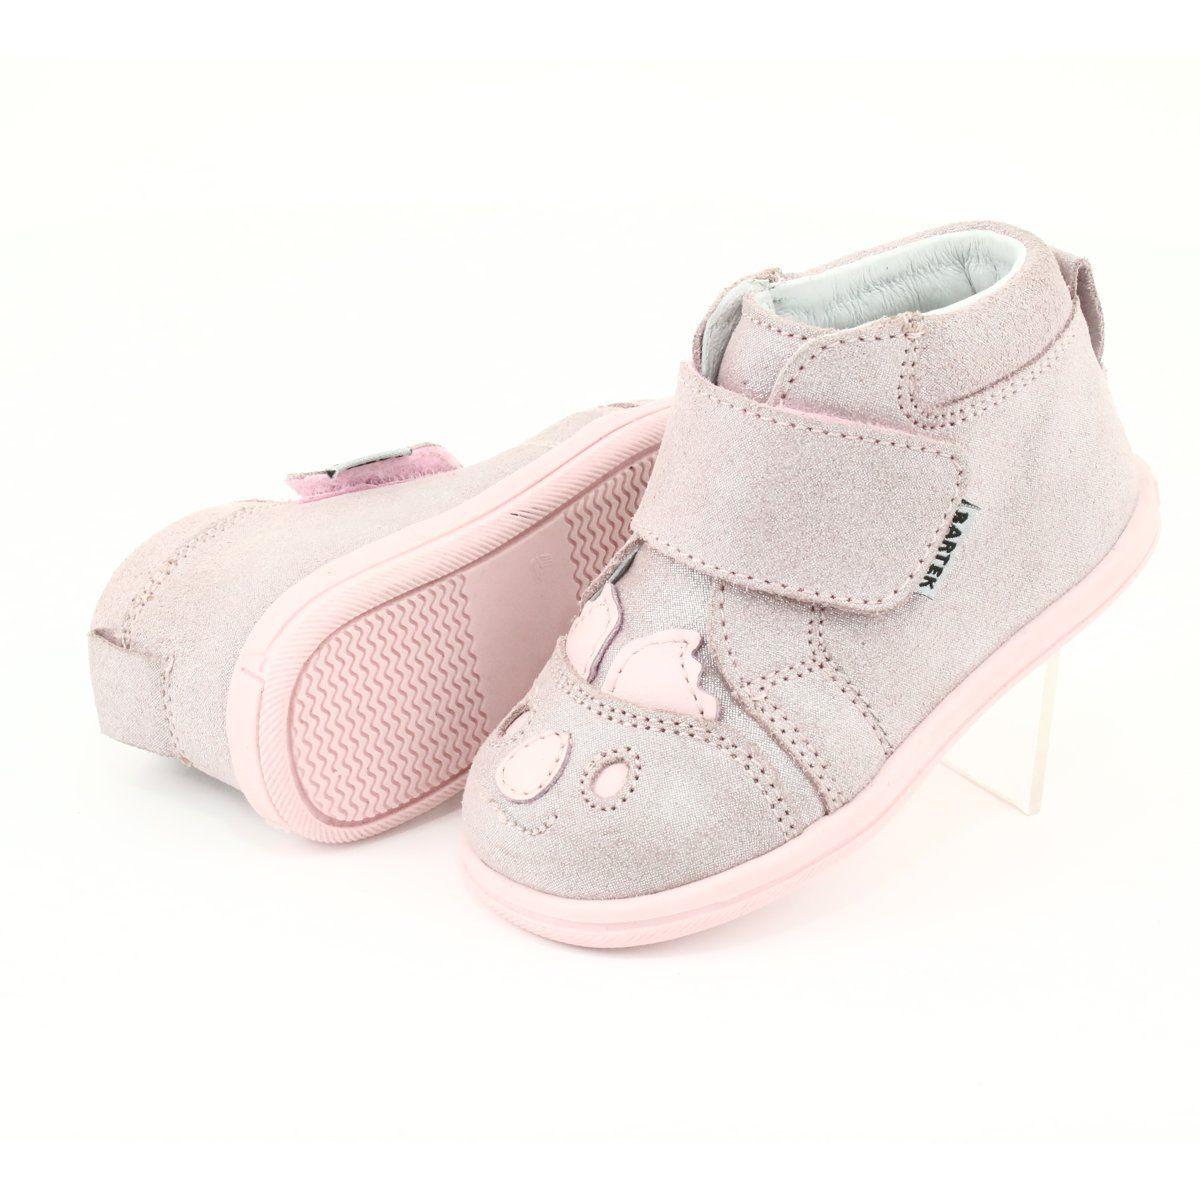 Trzewiki Na Rzepy Koala Bartek 71150 Rozowe Szare Slip On Sneaker Shoes Slip On